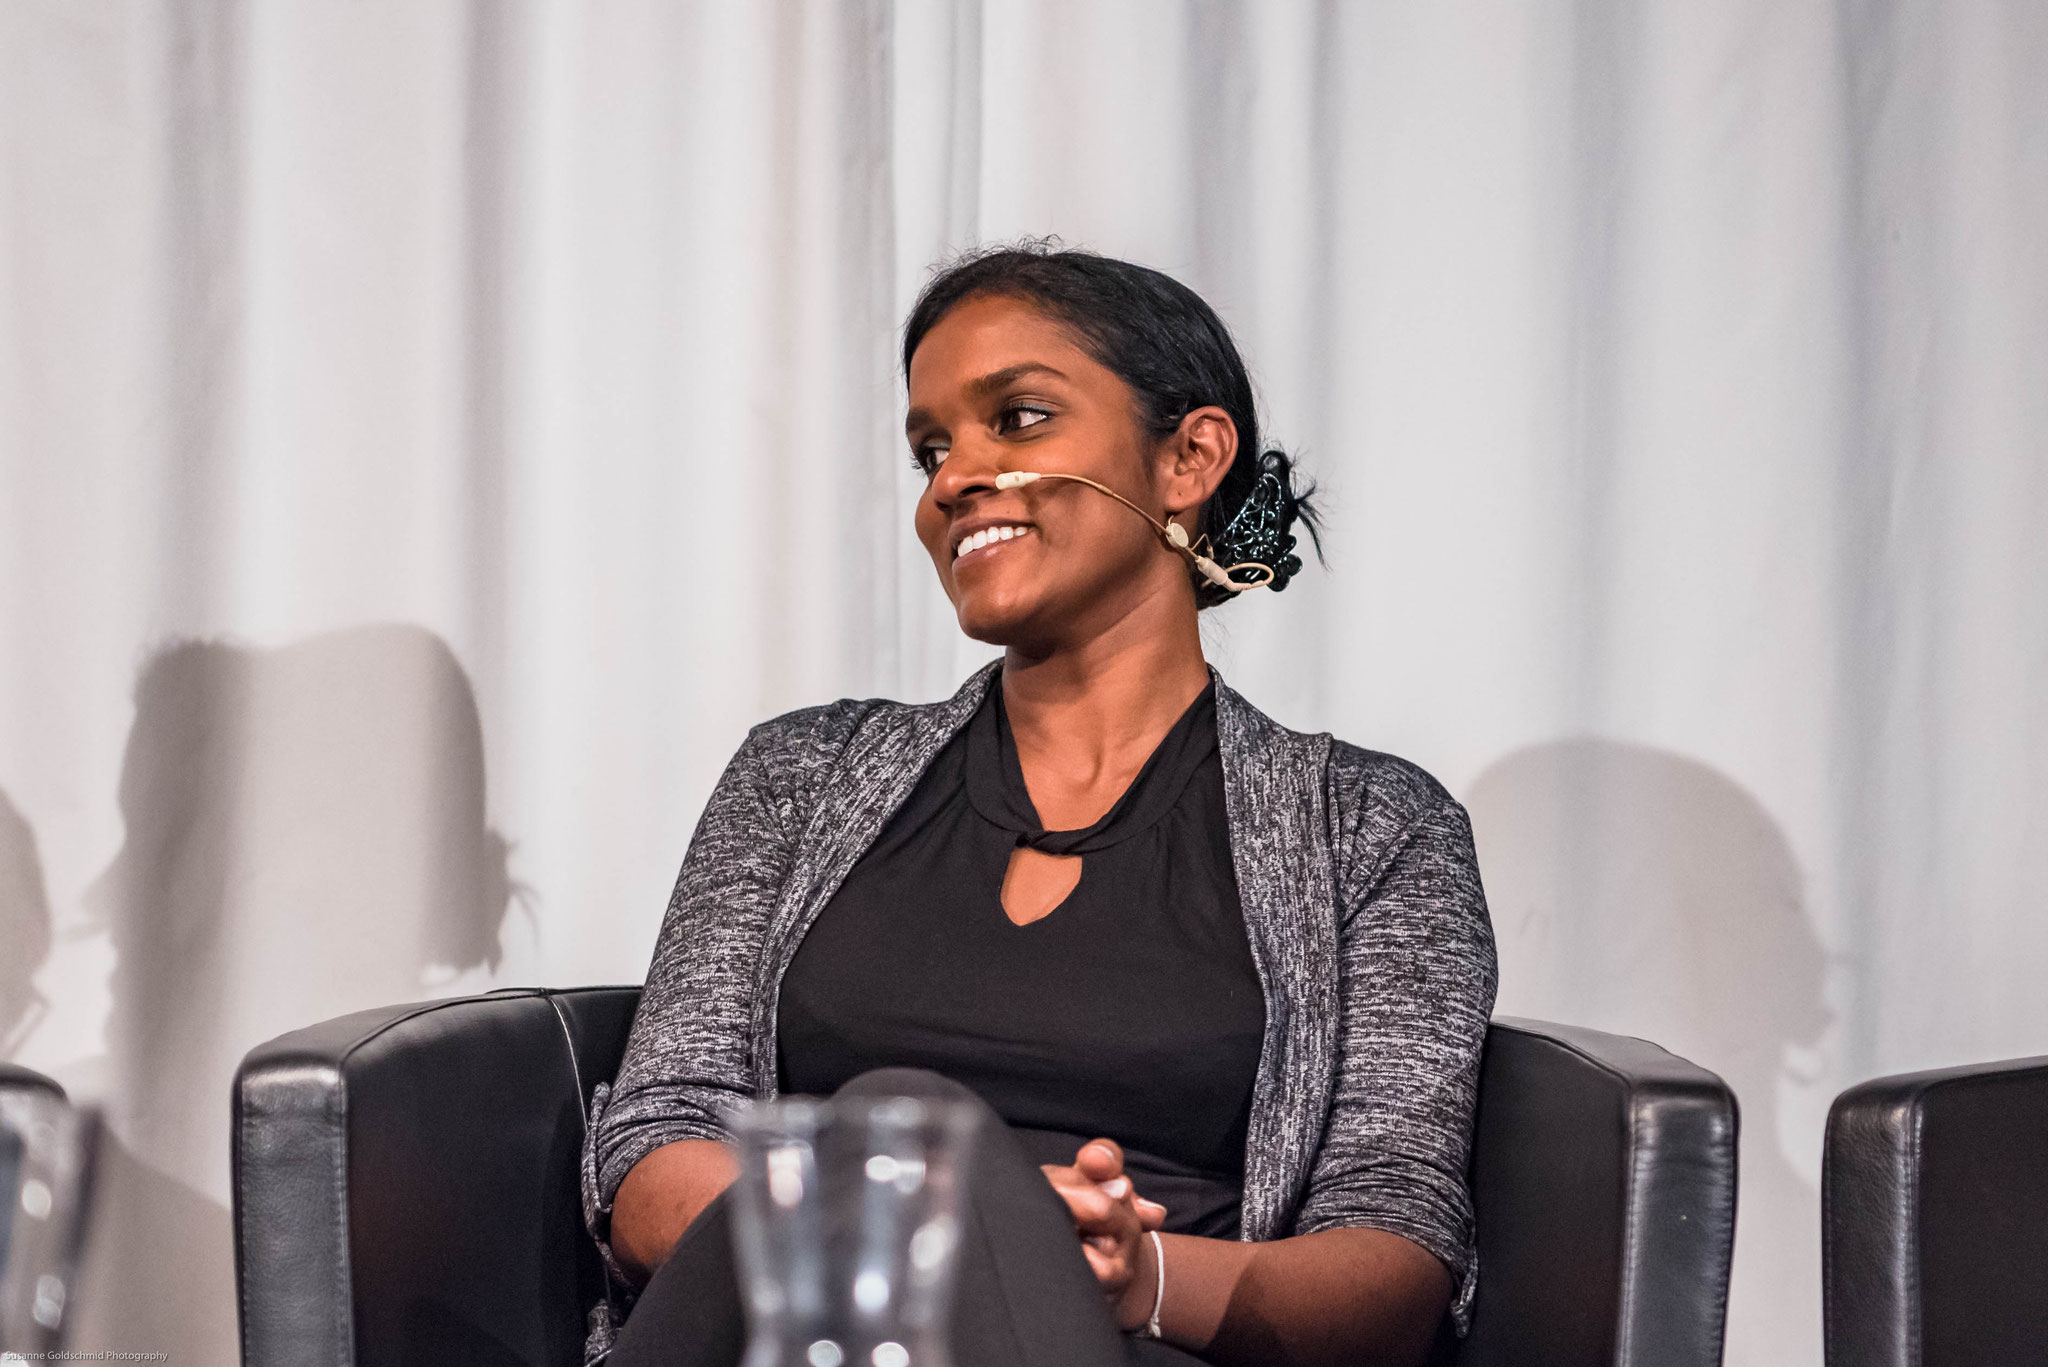 Sakuntala Küttel (Betroffene Adoptionsbetrug Sri Lanka und Portraitierte)